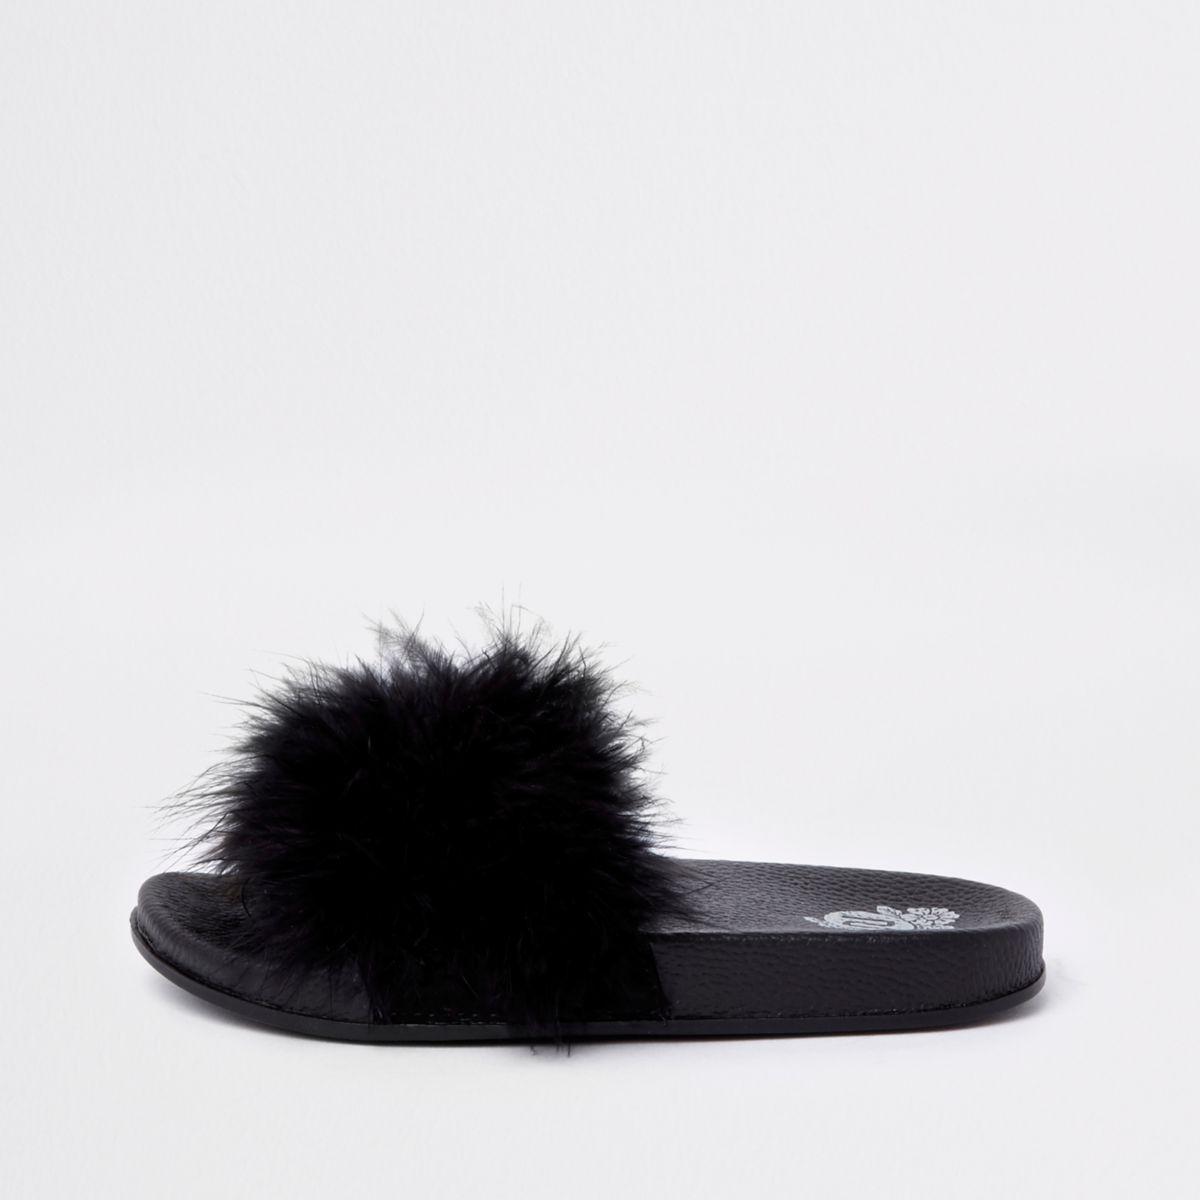 Girls black feather sliders